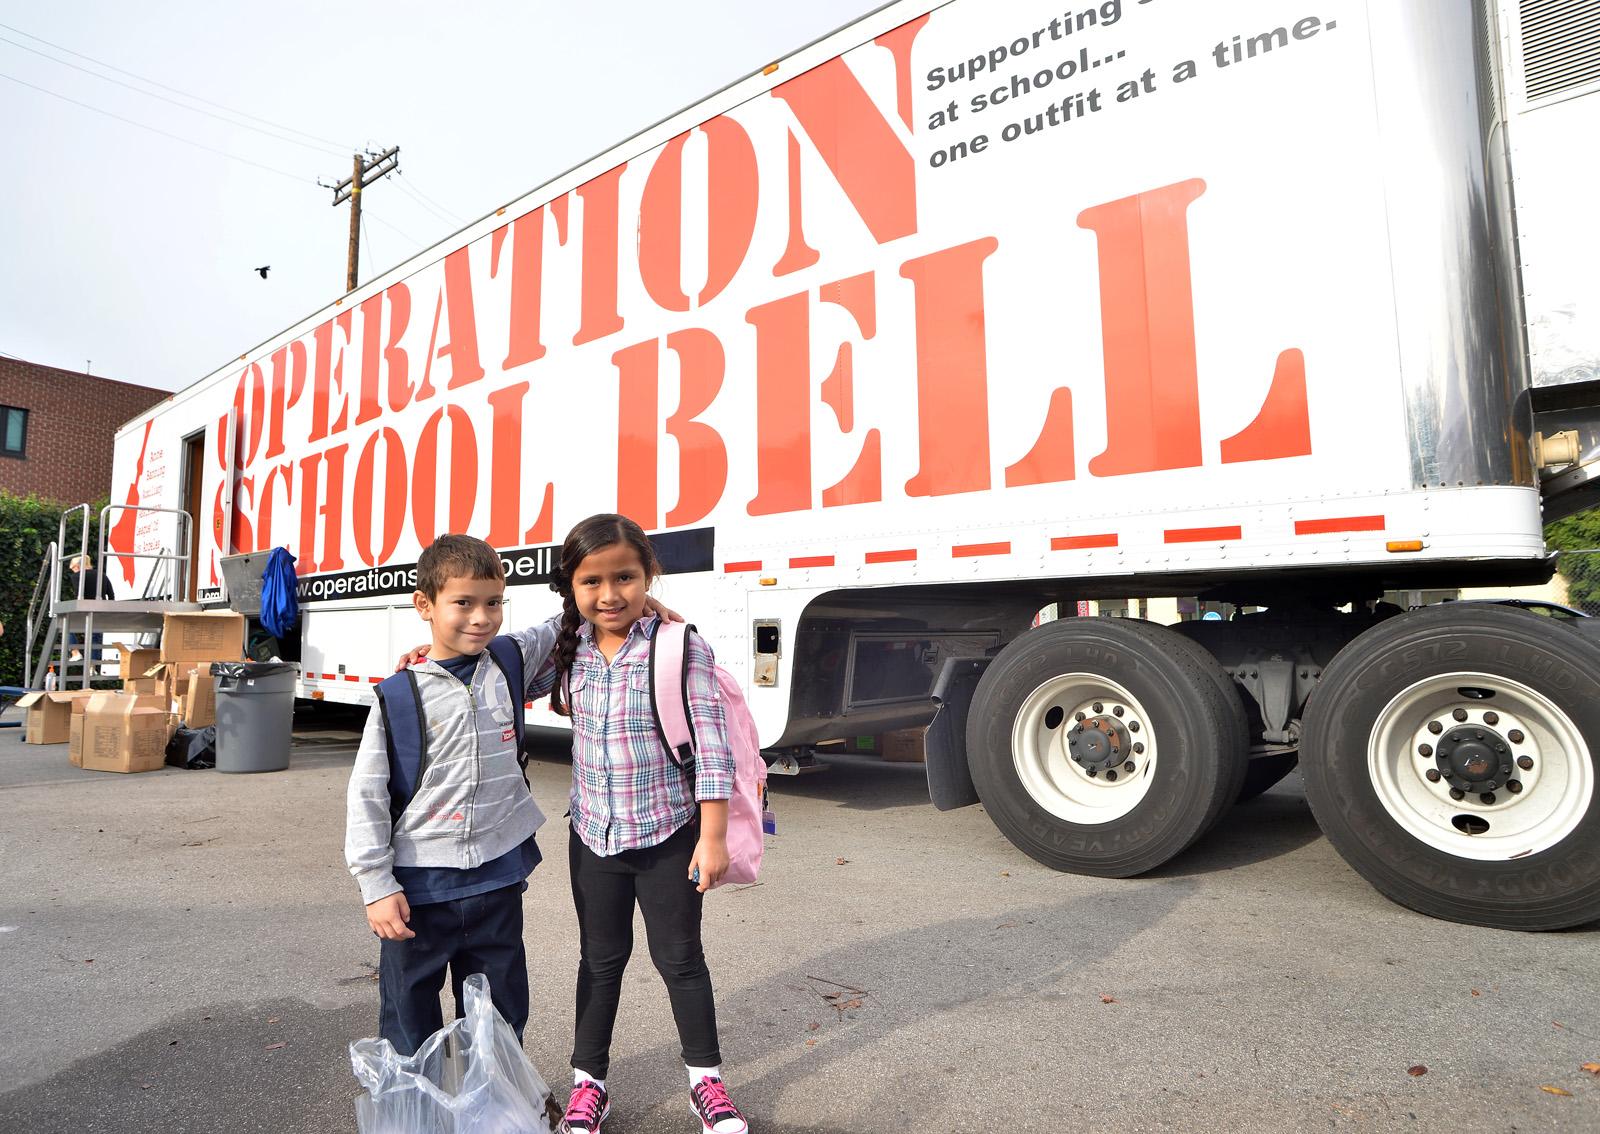 Operation School Bell, grantee of Jansen Foundation